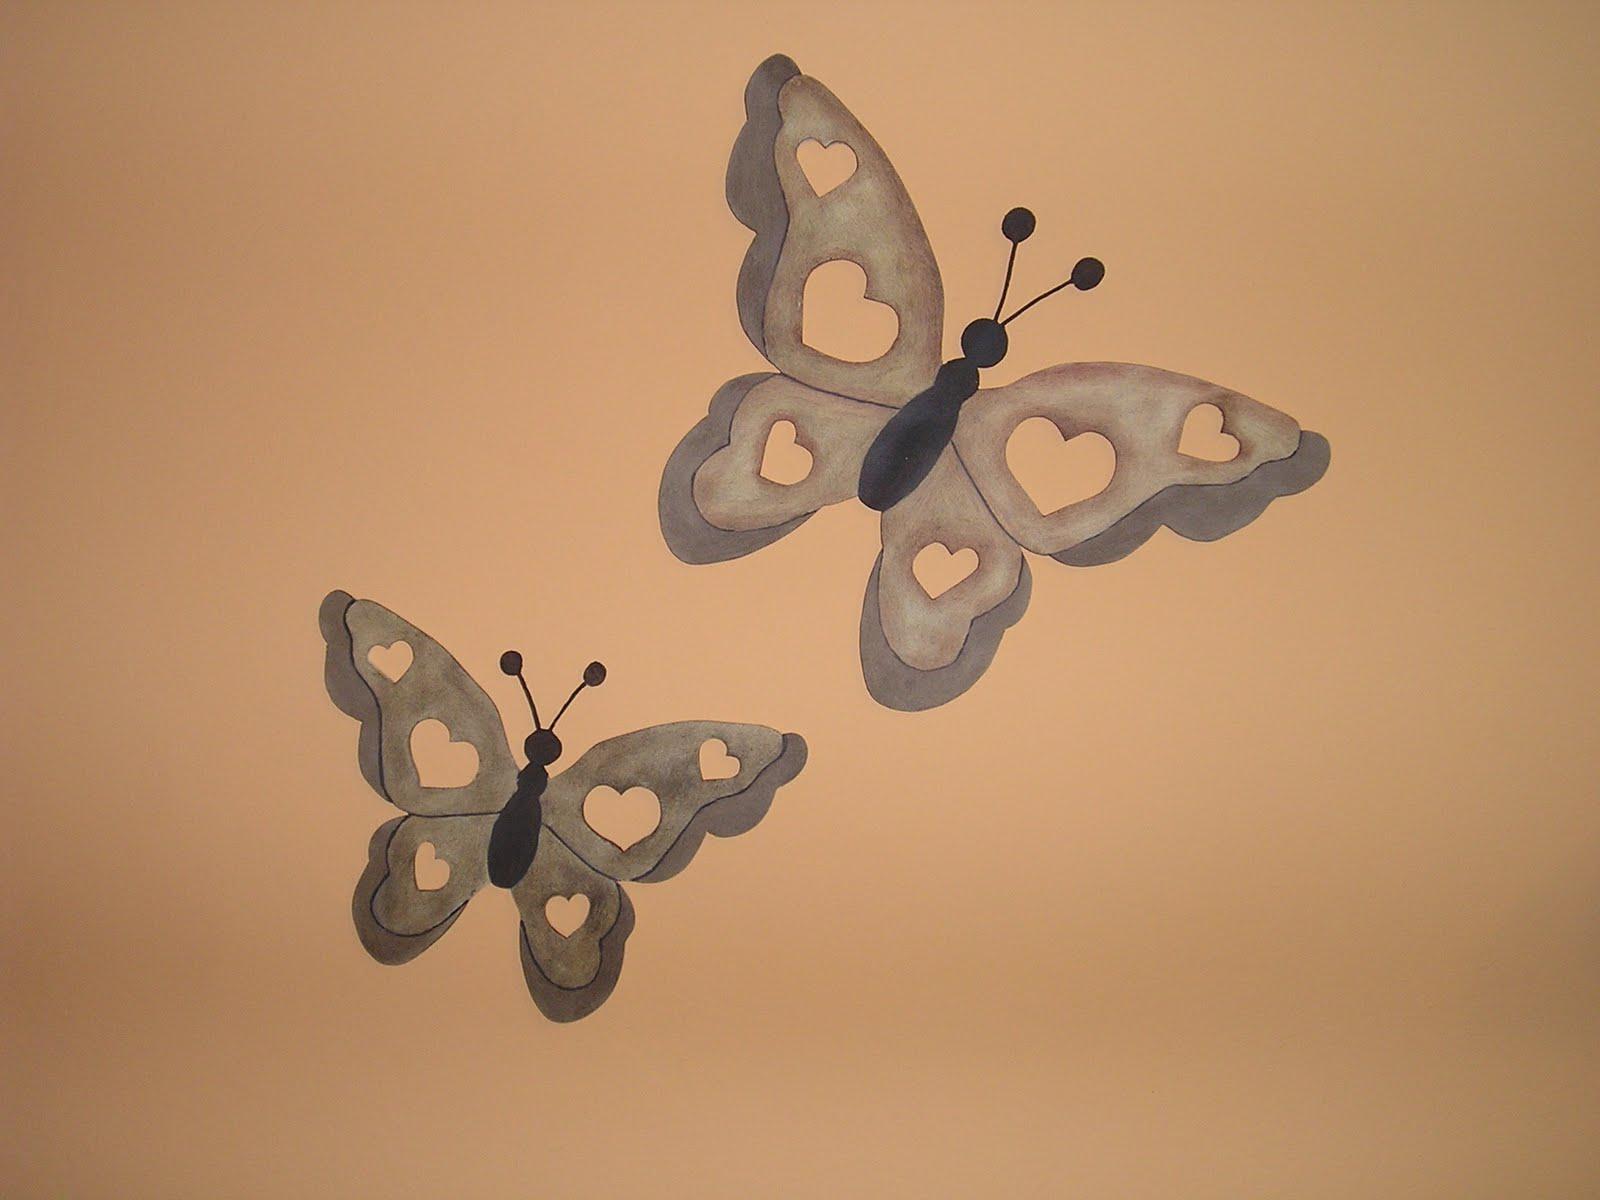 Plantillas de mariposas para pintar paredes imagui - Plantillas para paredes ...